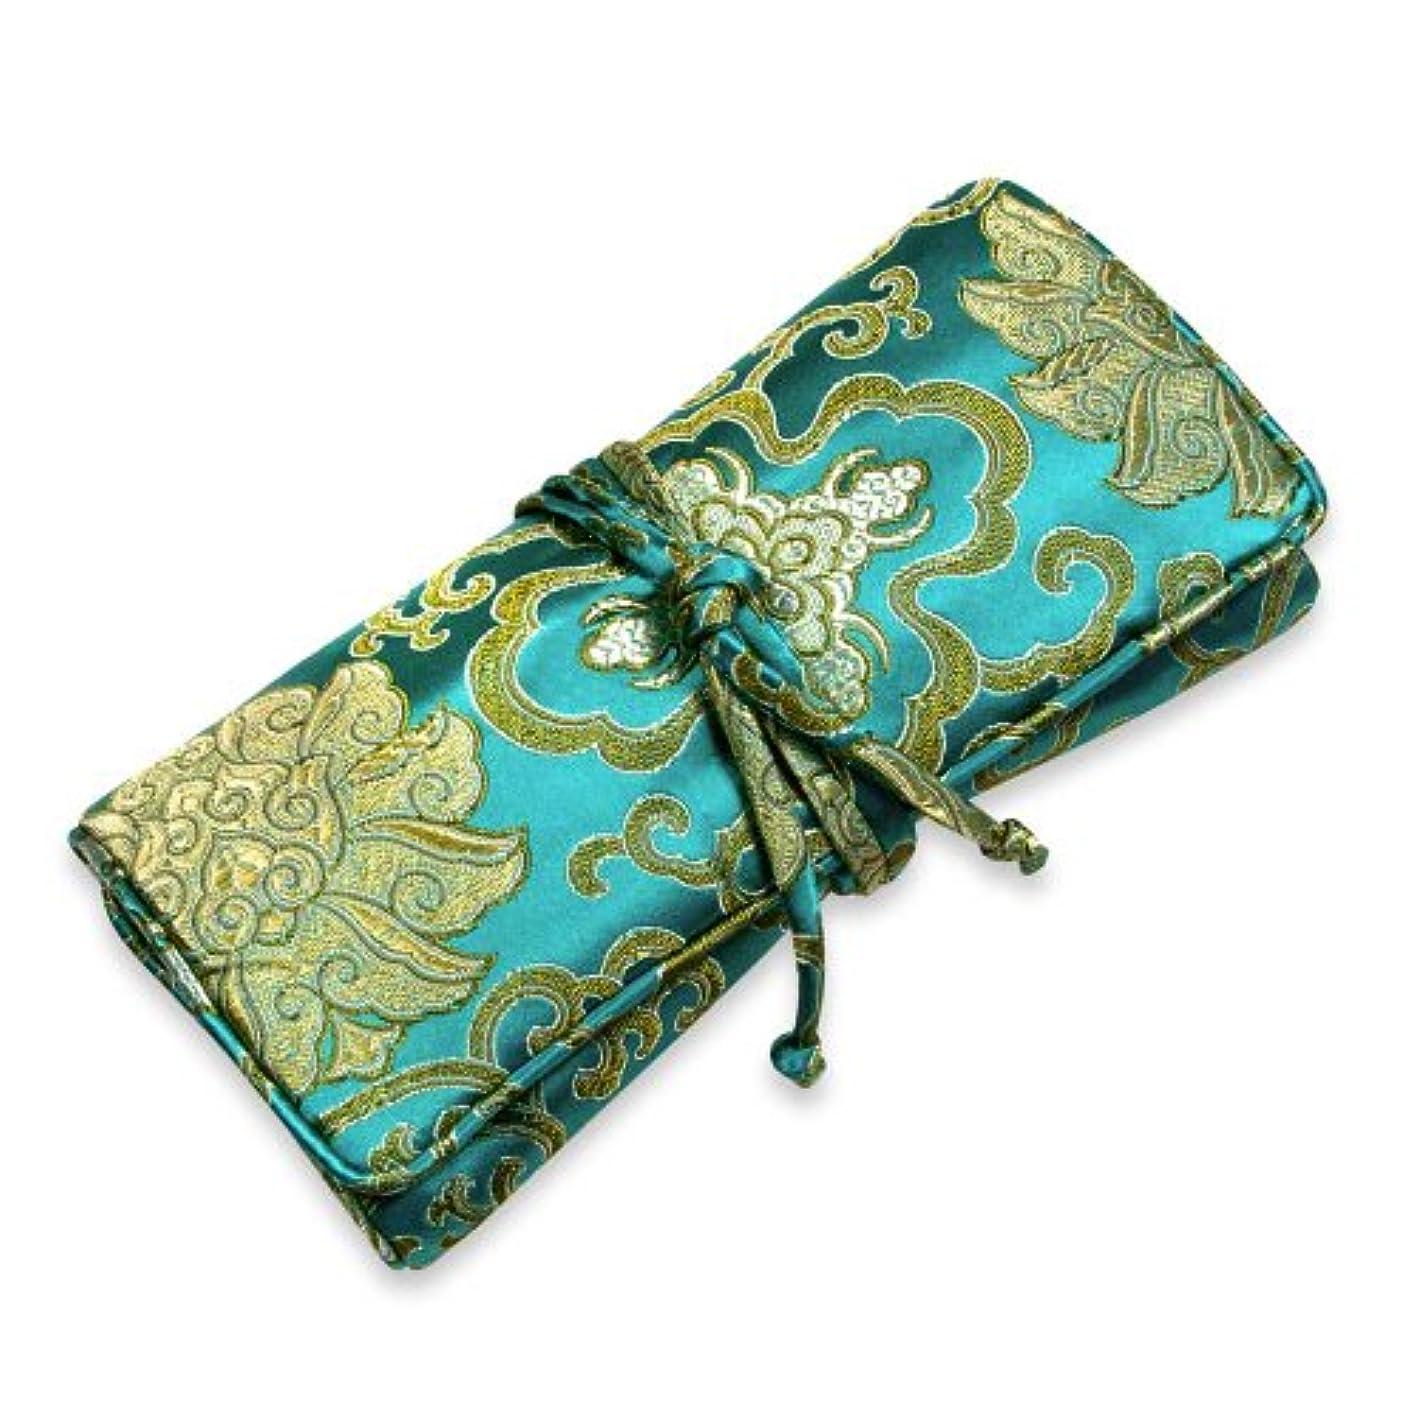 Jewelry Roll Clutch Large - Silk Brocade (Lotus Marine)